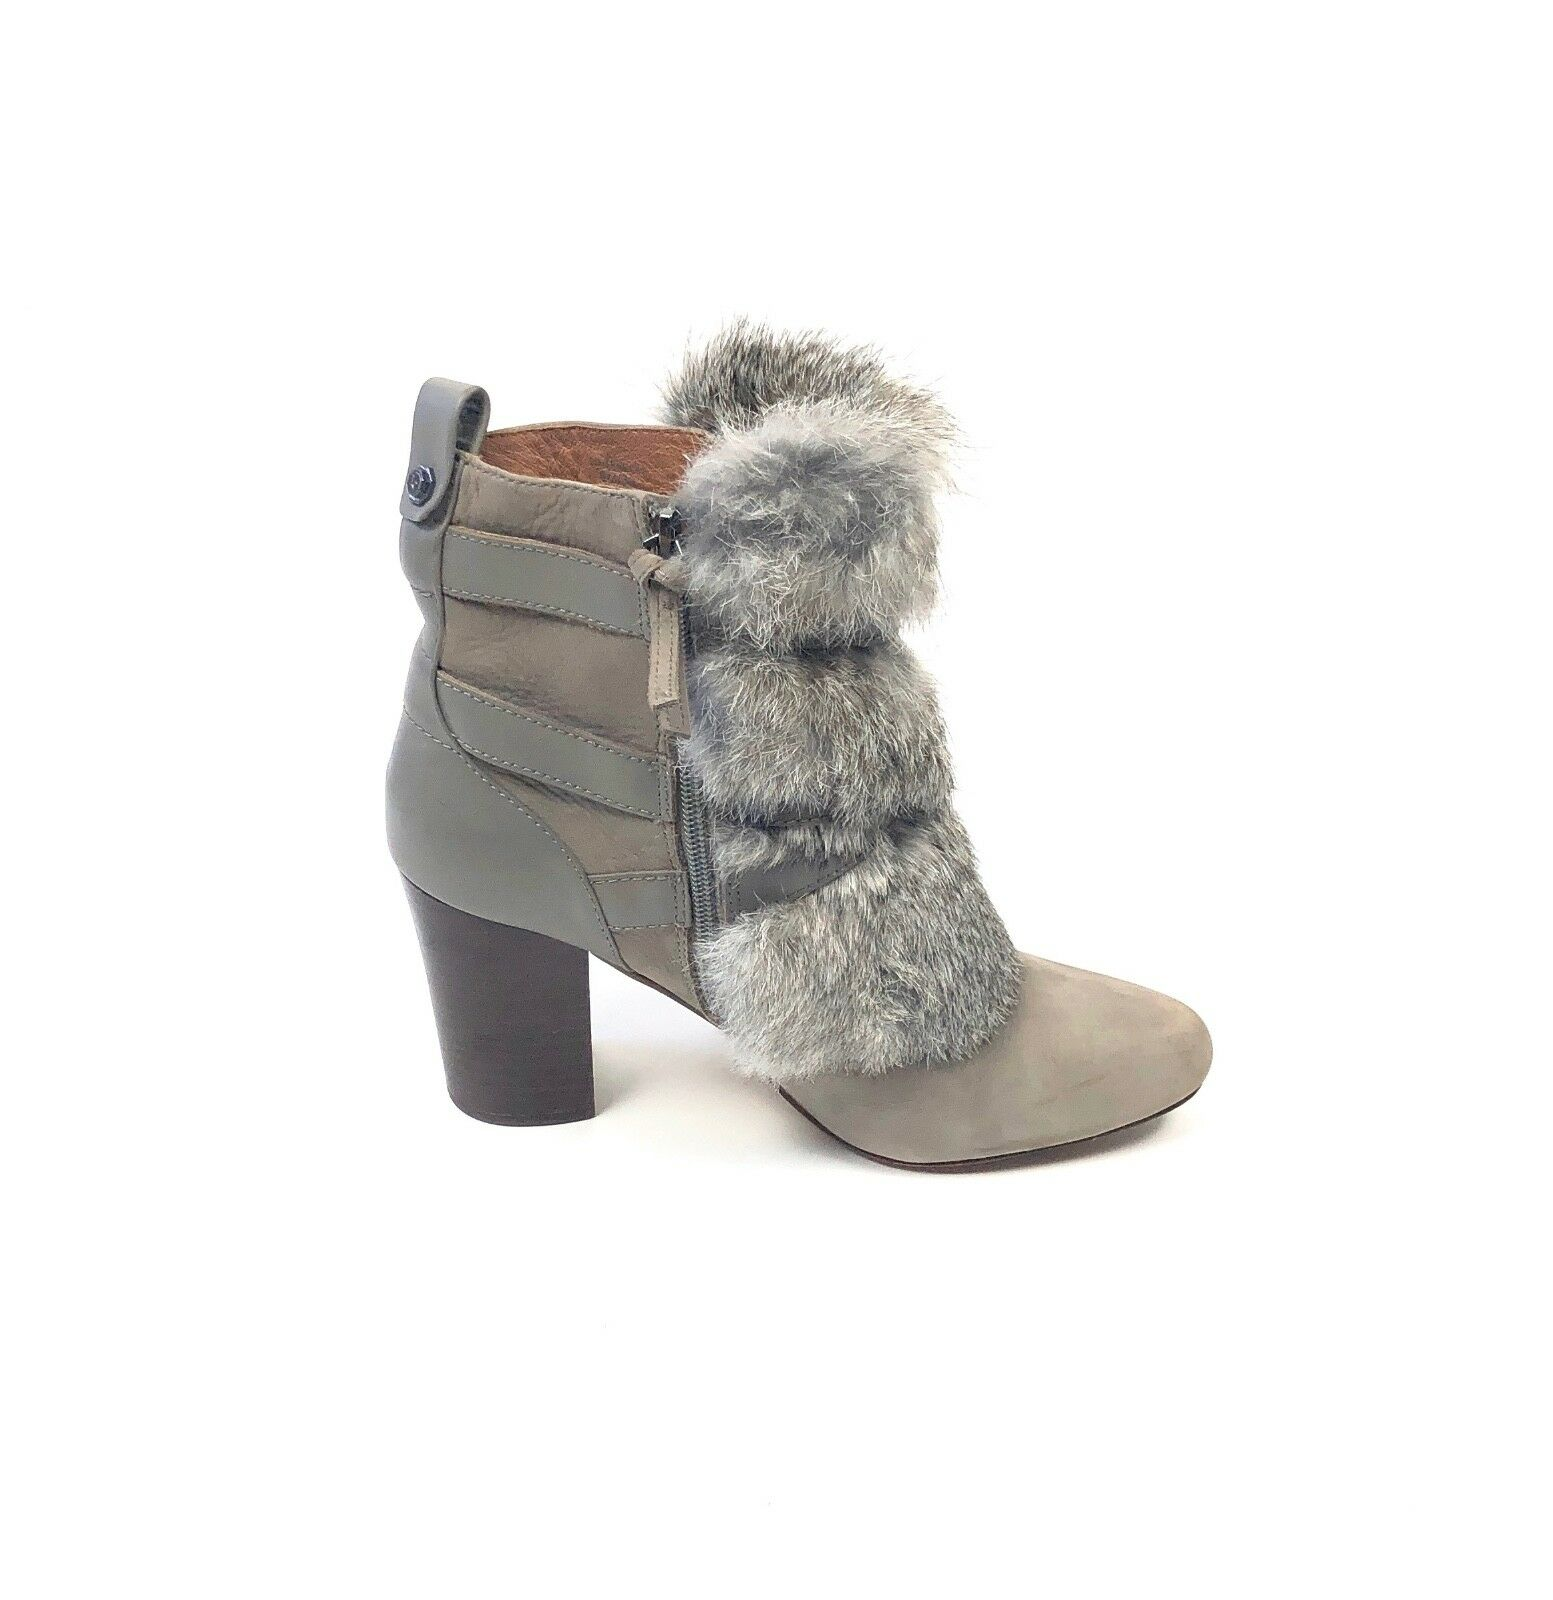 Louise et Cie Yuma Beige Suede And Rabbit Fur Boots Size 9